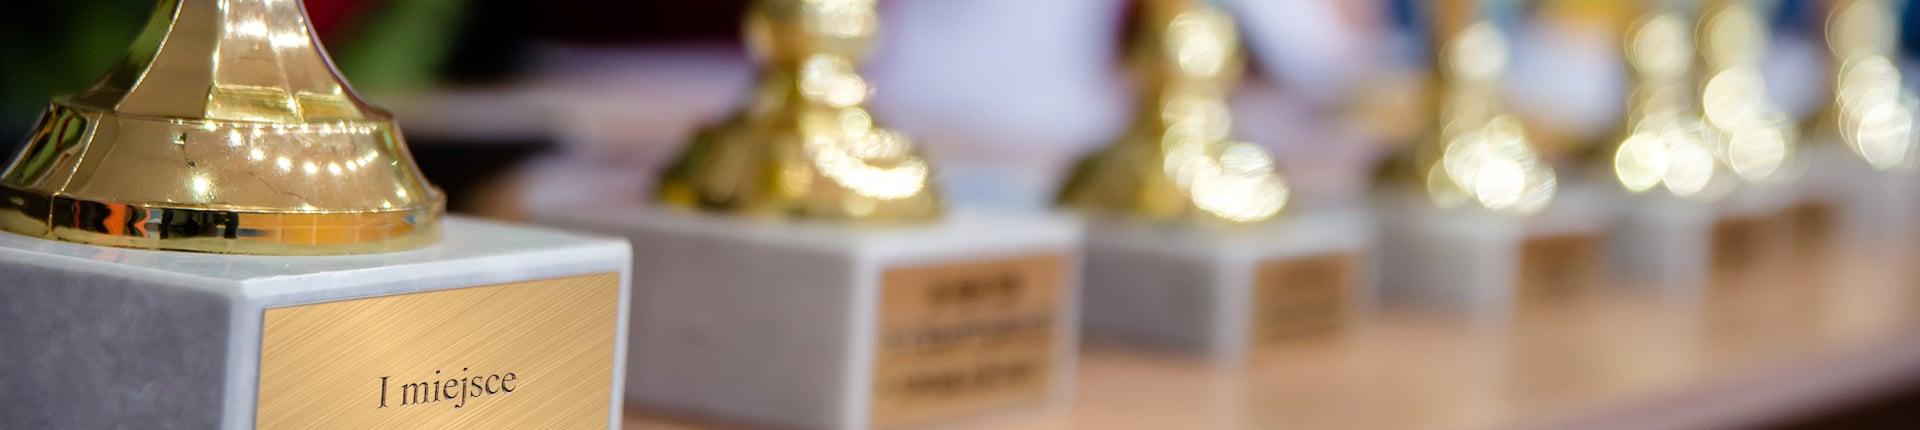 MŚ IFBB 2019 - pierwsze medale!